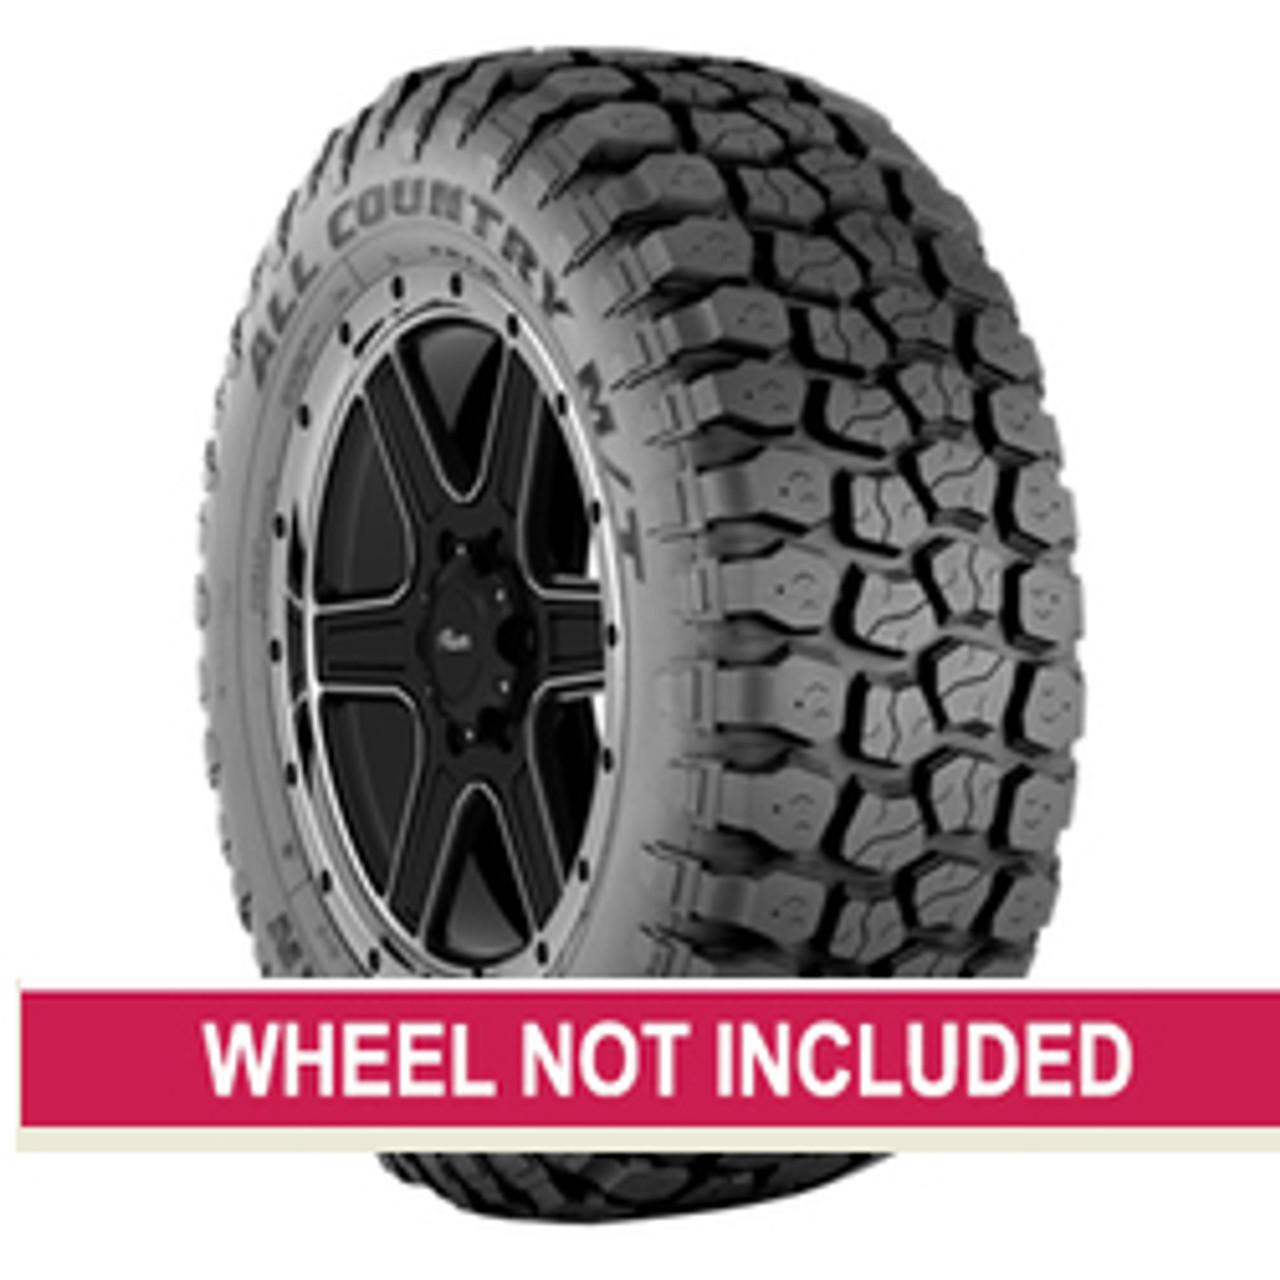 New Tire 315 70 17 Ironman Mud MT 10 Ply LT315/70R17